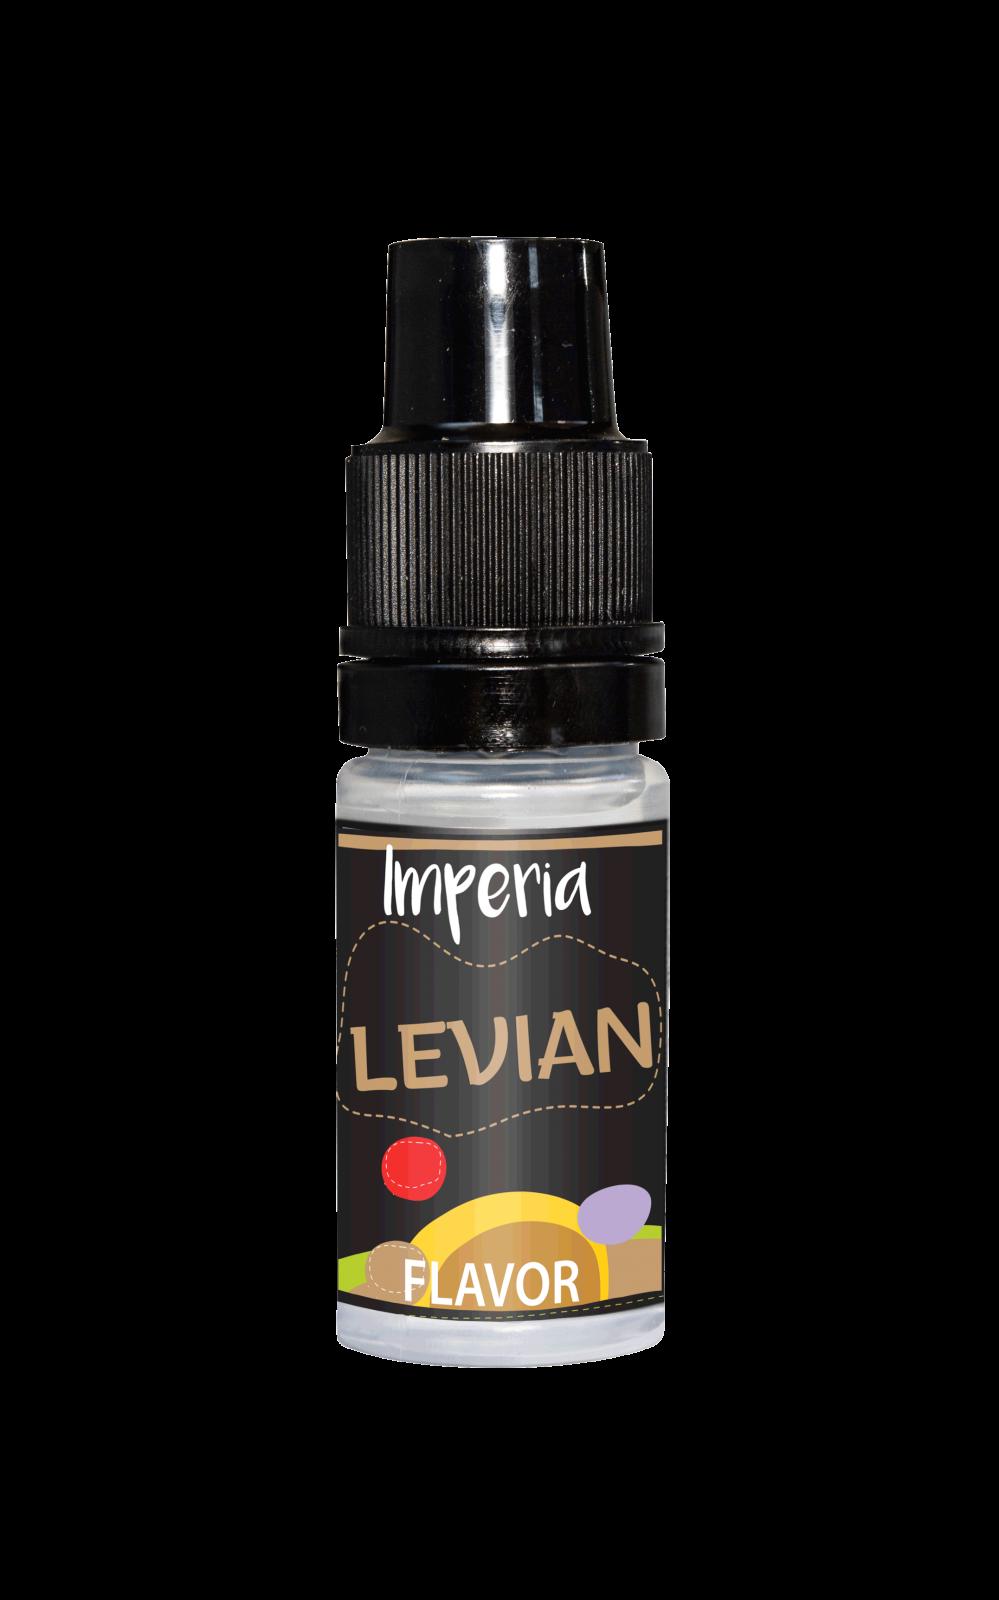 LEVIAN - Aróma Imperia Black Label Boudoir Samadhi s.r.o.